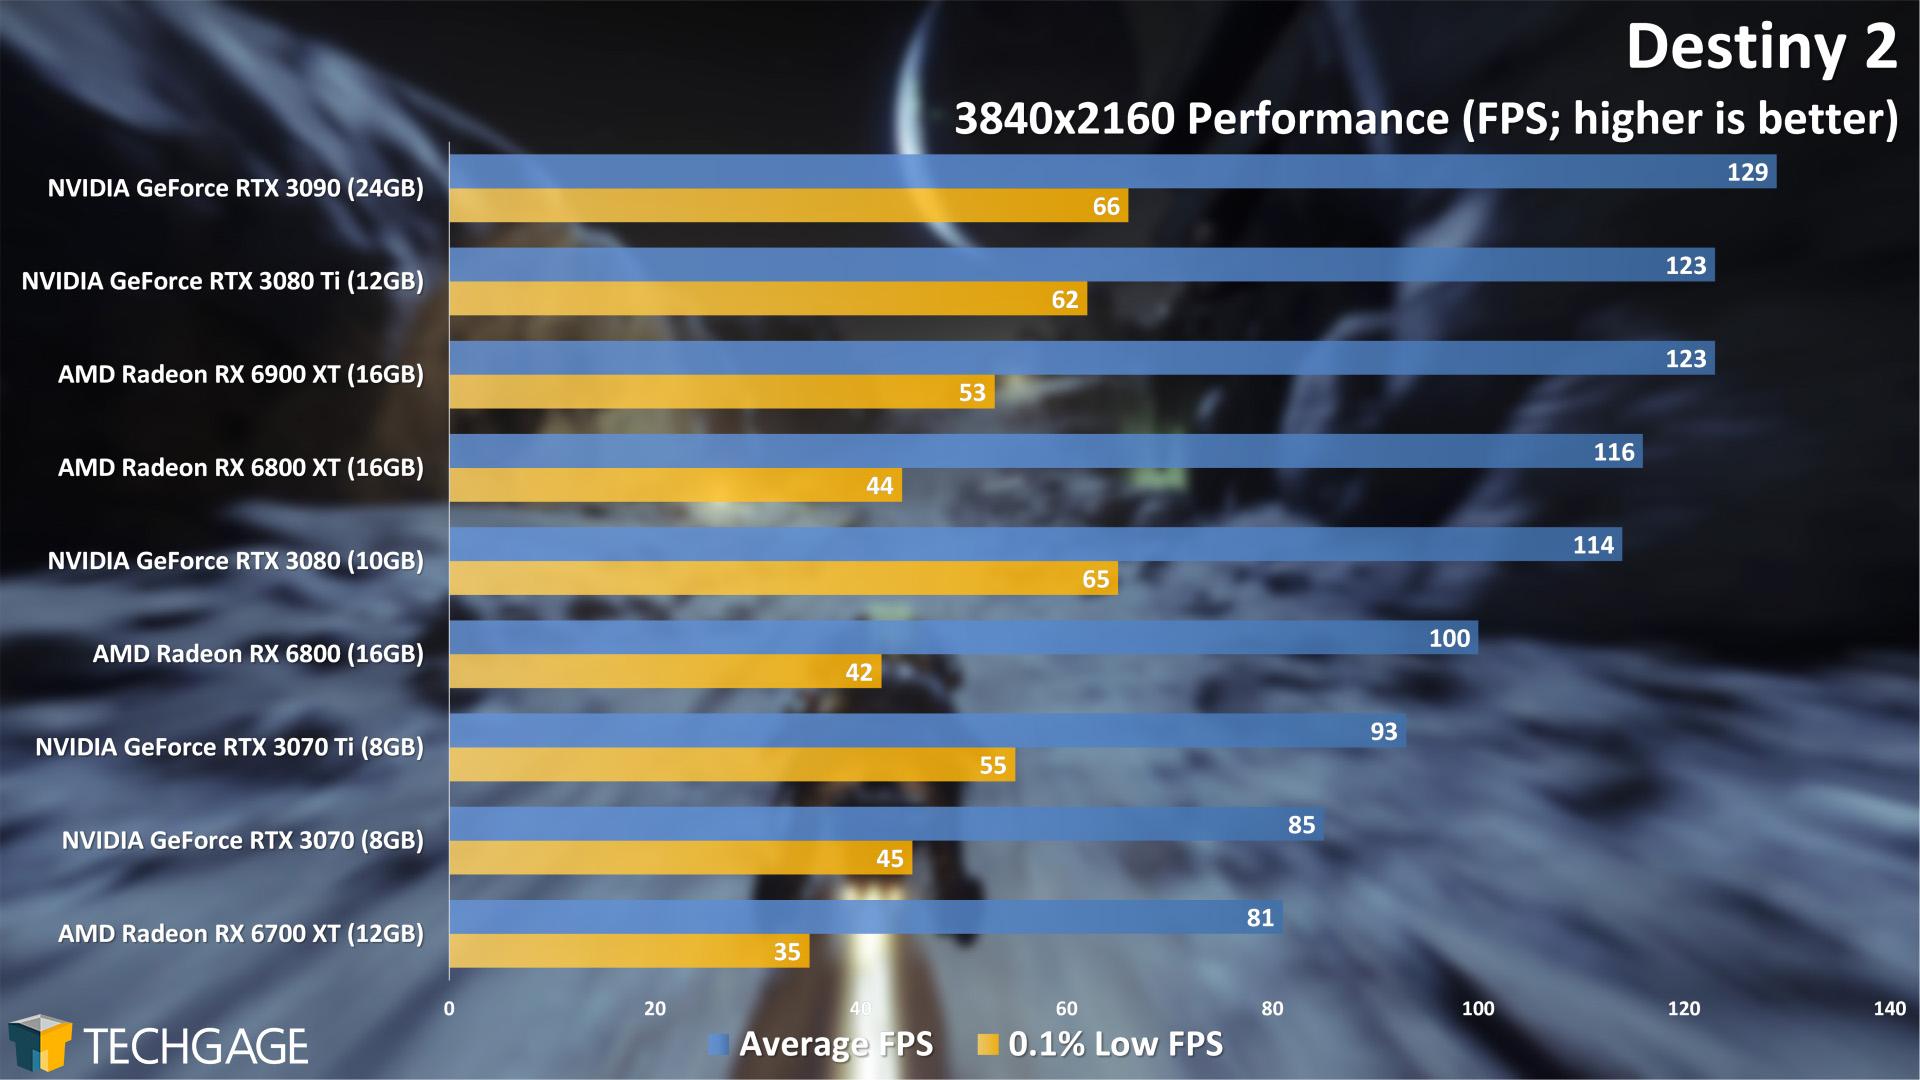 Destiny 2 - 2160p Performance (NVIDIA GeForce RTX 3070 Ti)